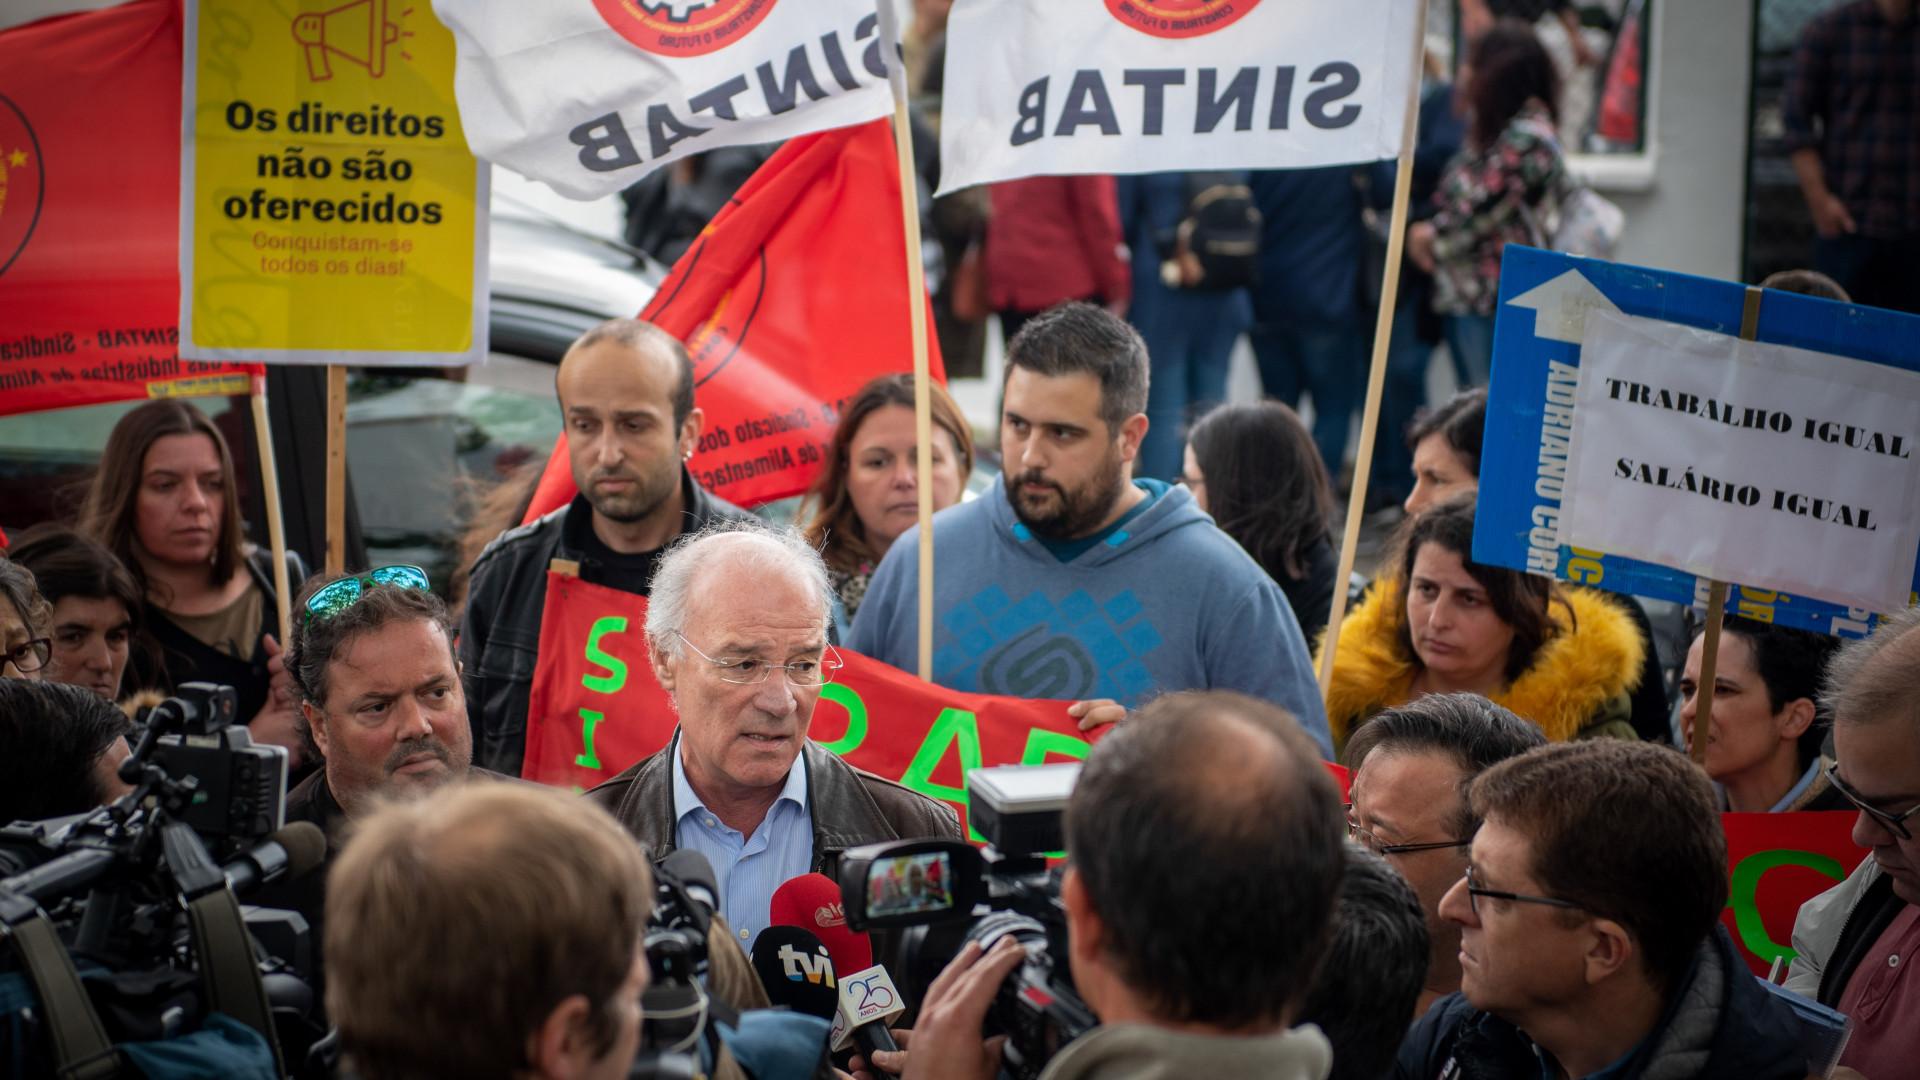 CGTP adverte Governo que vai intensificar luta nas empresas e nas ruas